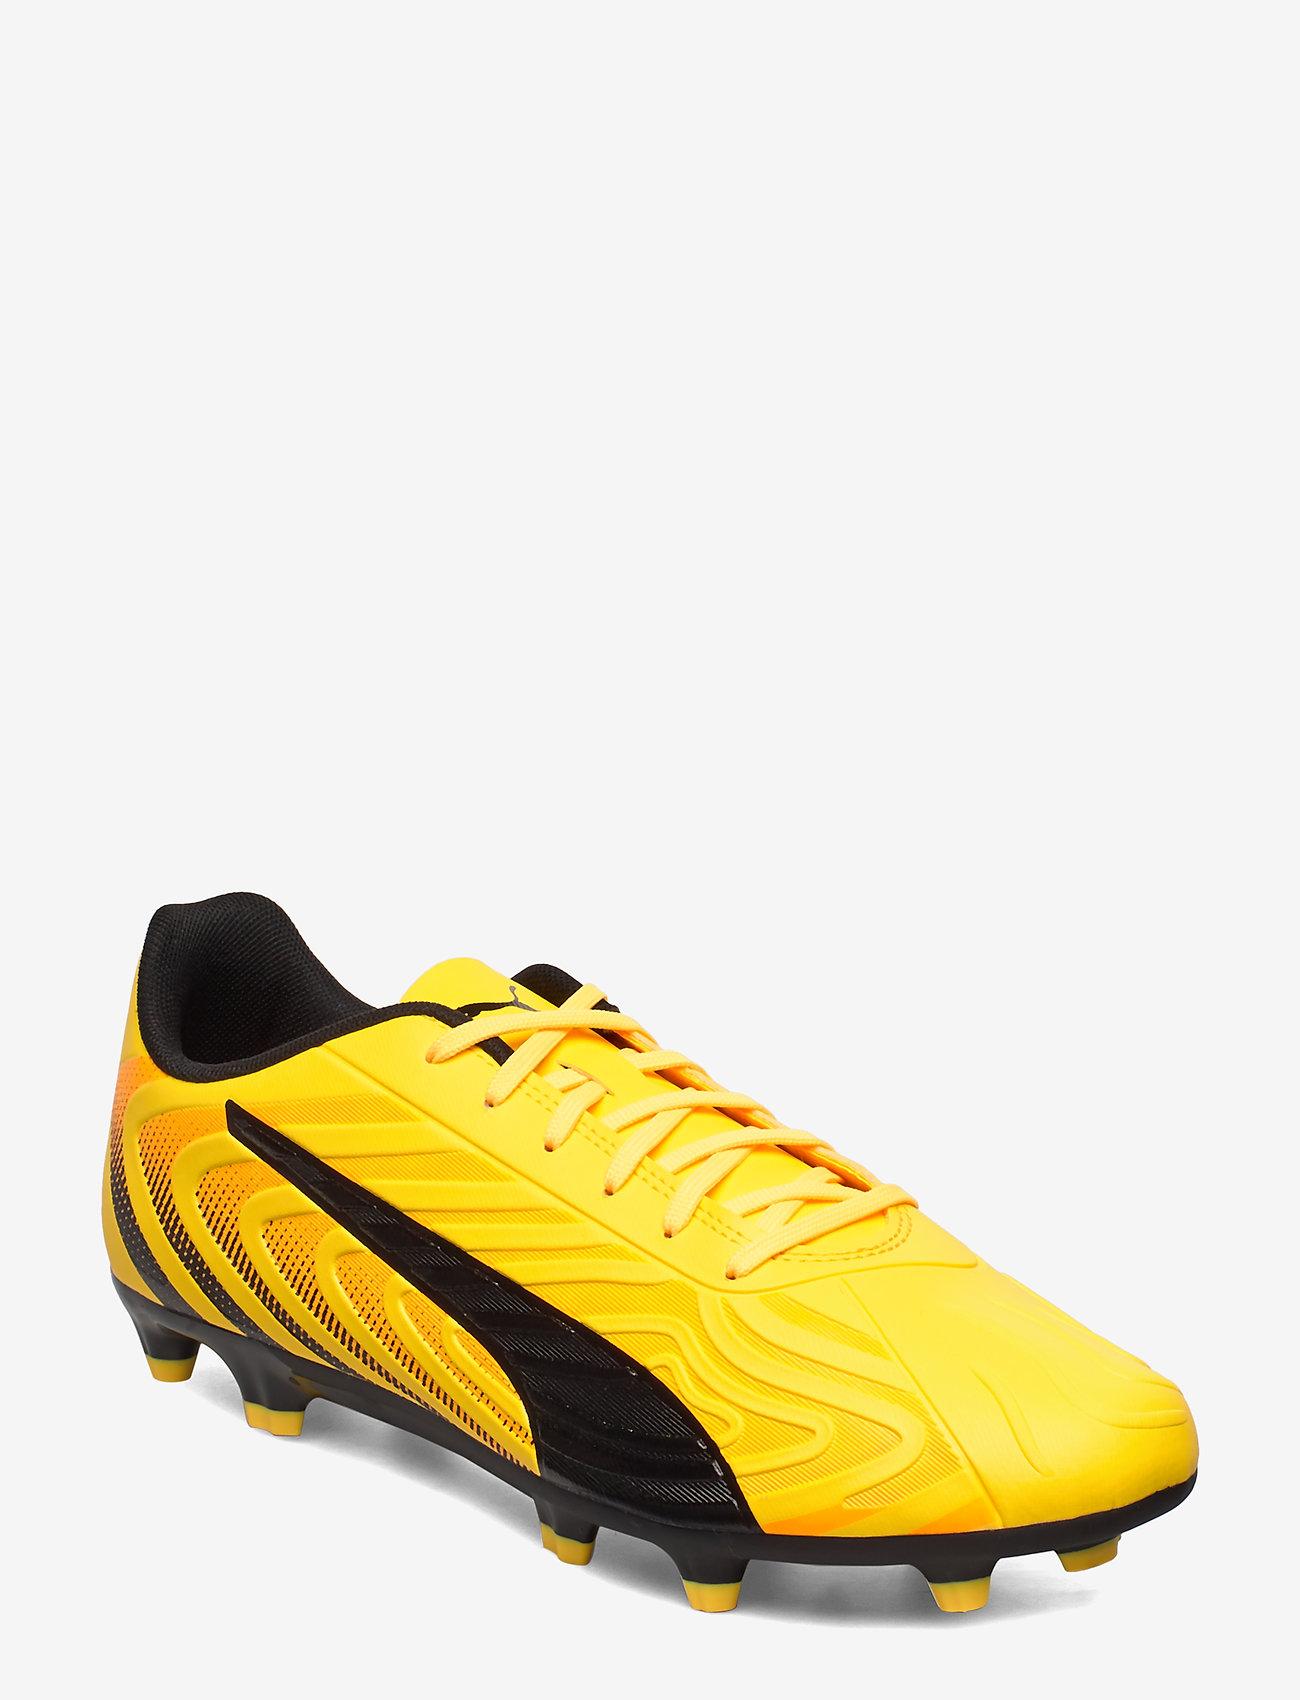 PUMA - PUMA ONE 20.4 FG/AG - jalkapallokengät - ultra yellow-puma black-orange aler - 0